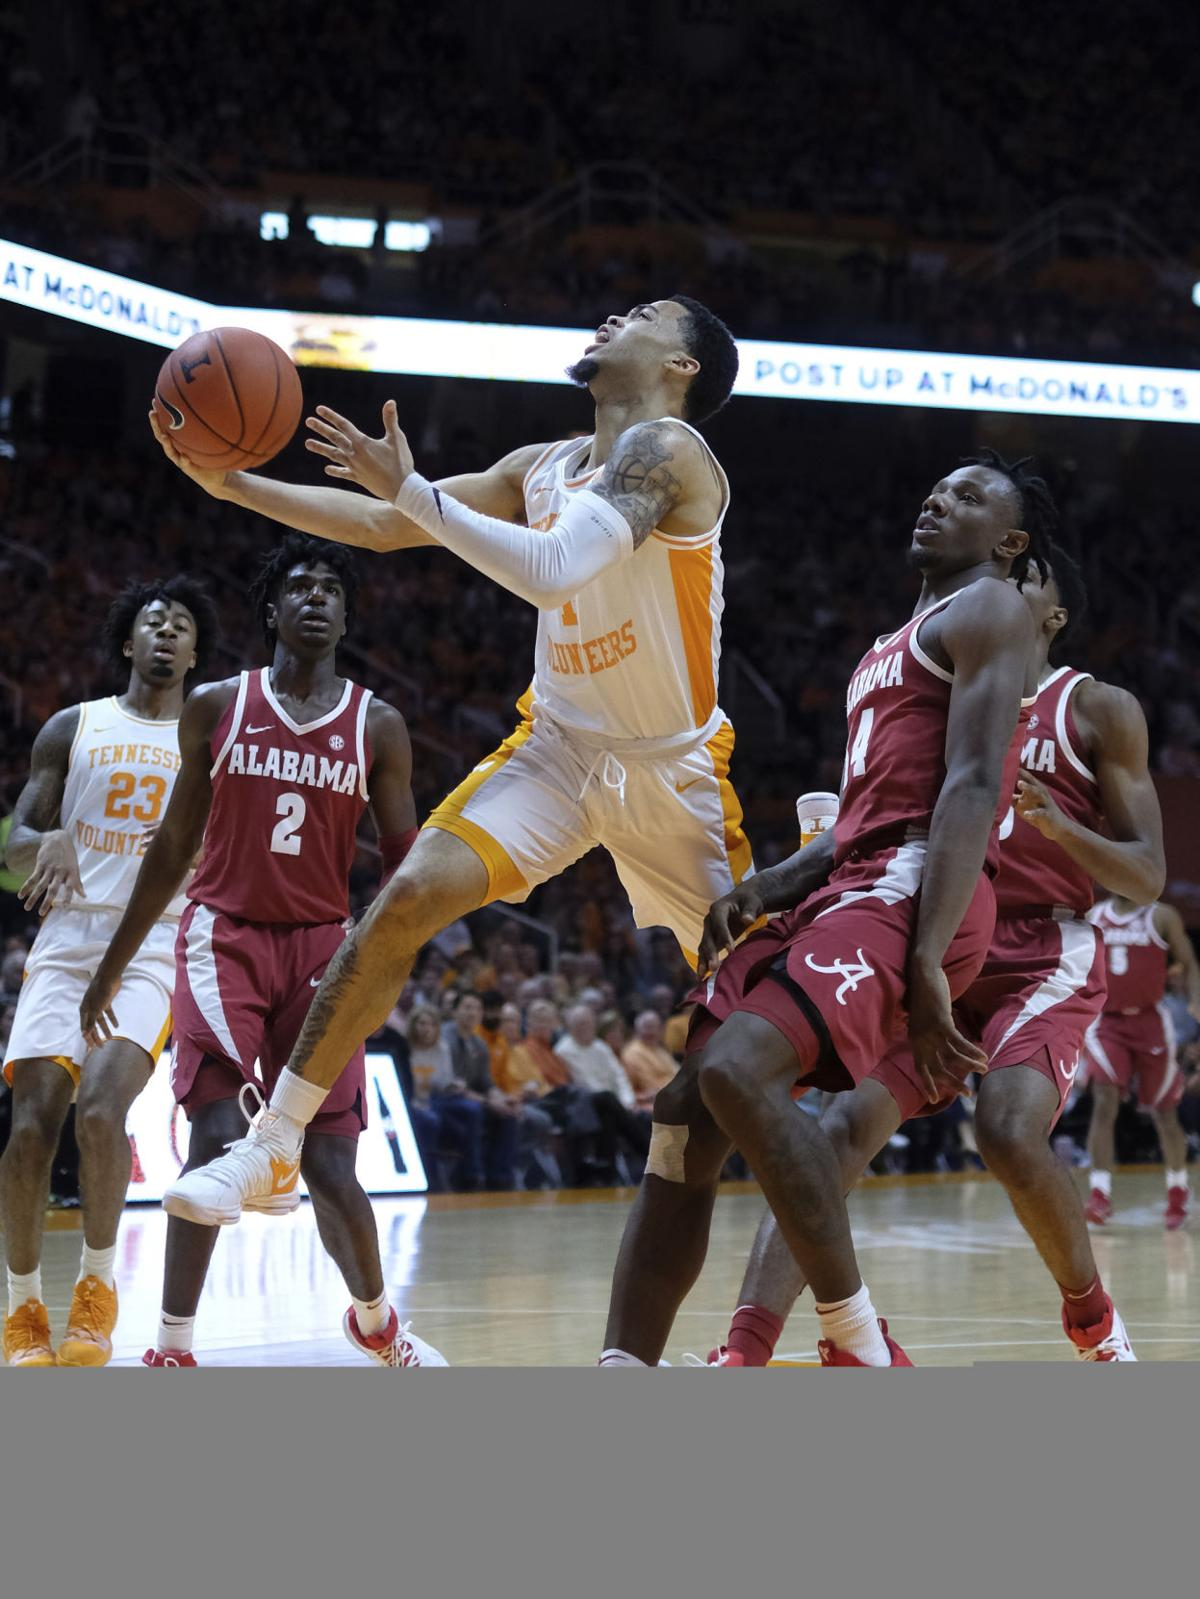 Vols assume No. 1 spot in AP basketball rankings